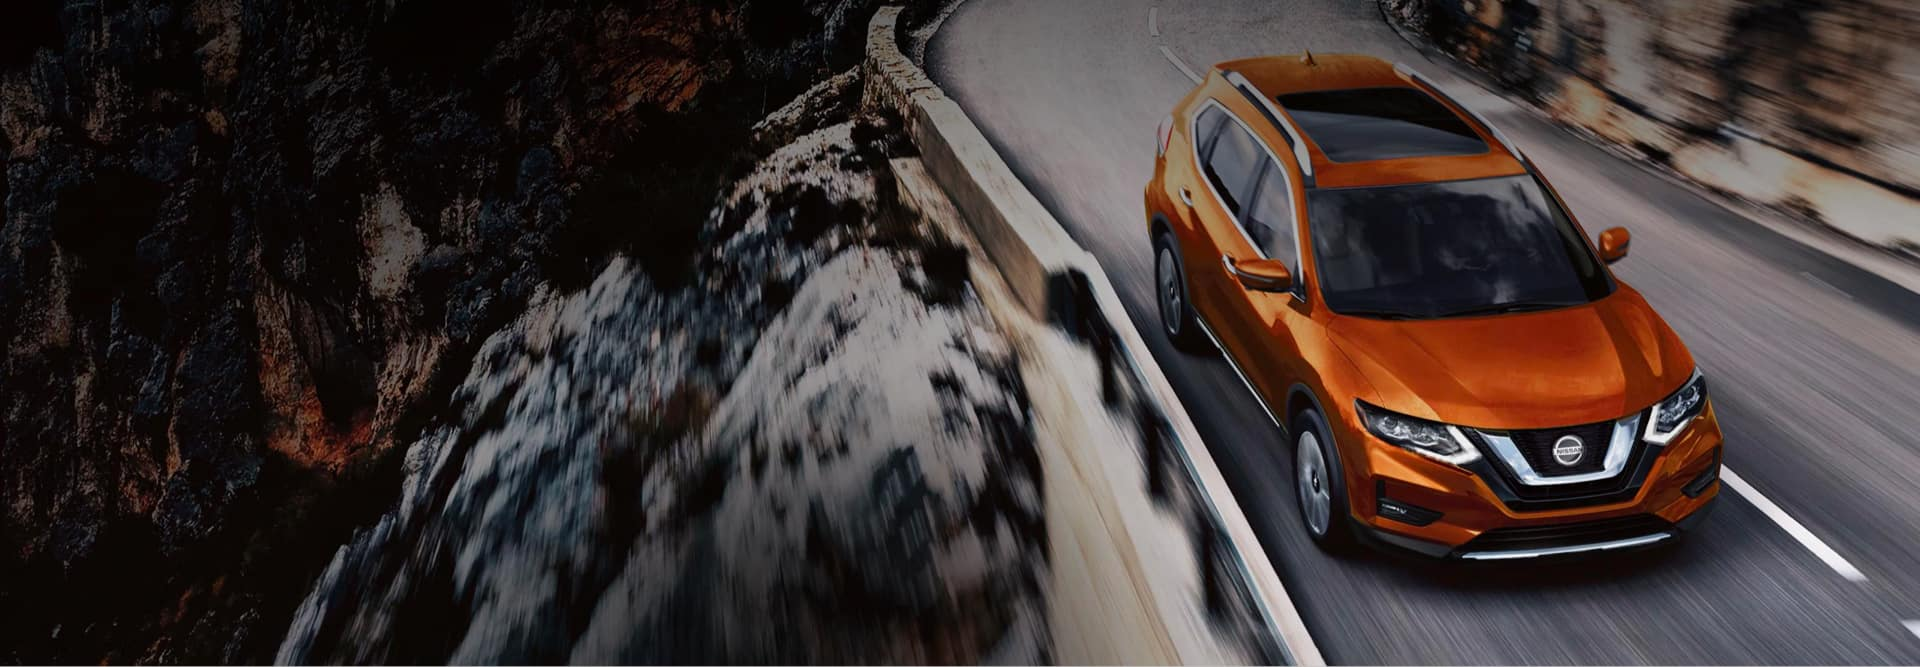 New Orange Nissan on Highway